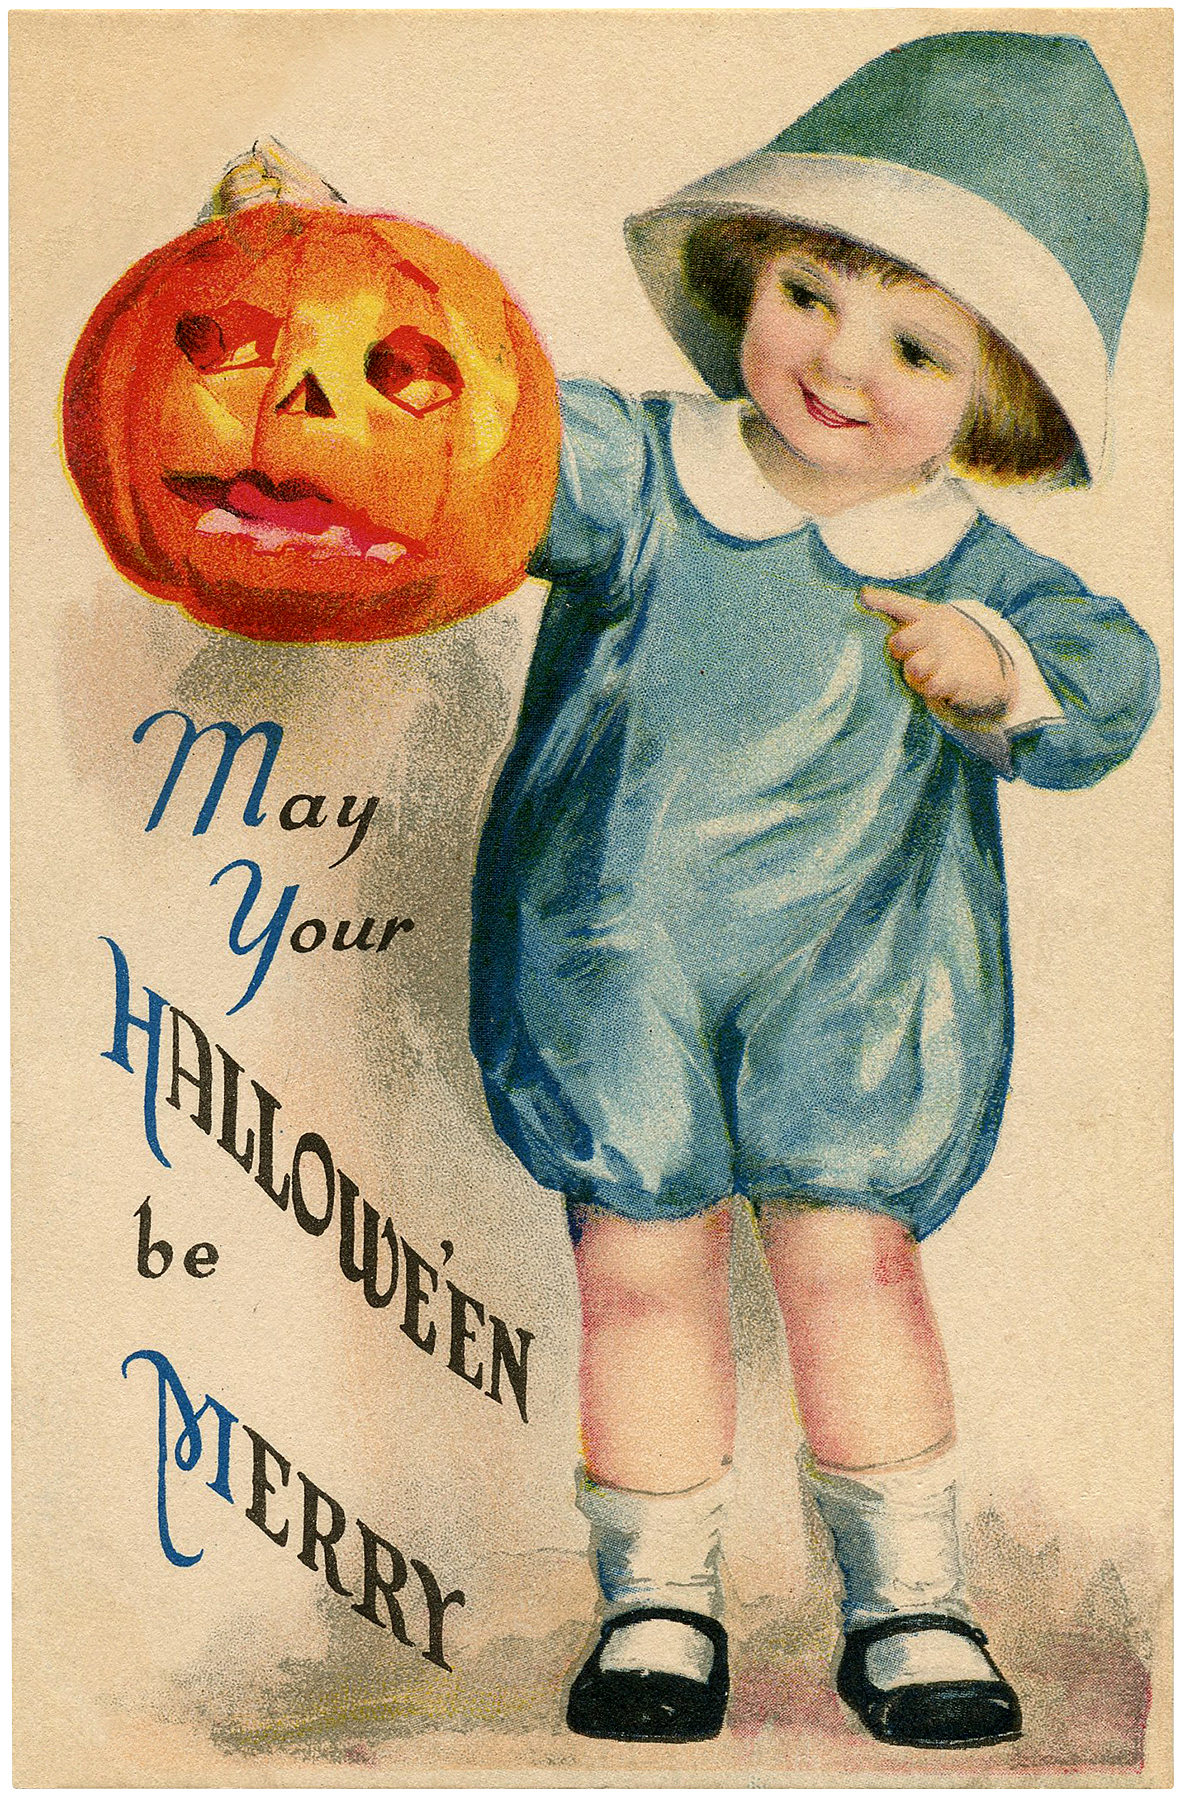 Adorable Vintage Halloween Image